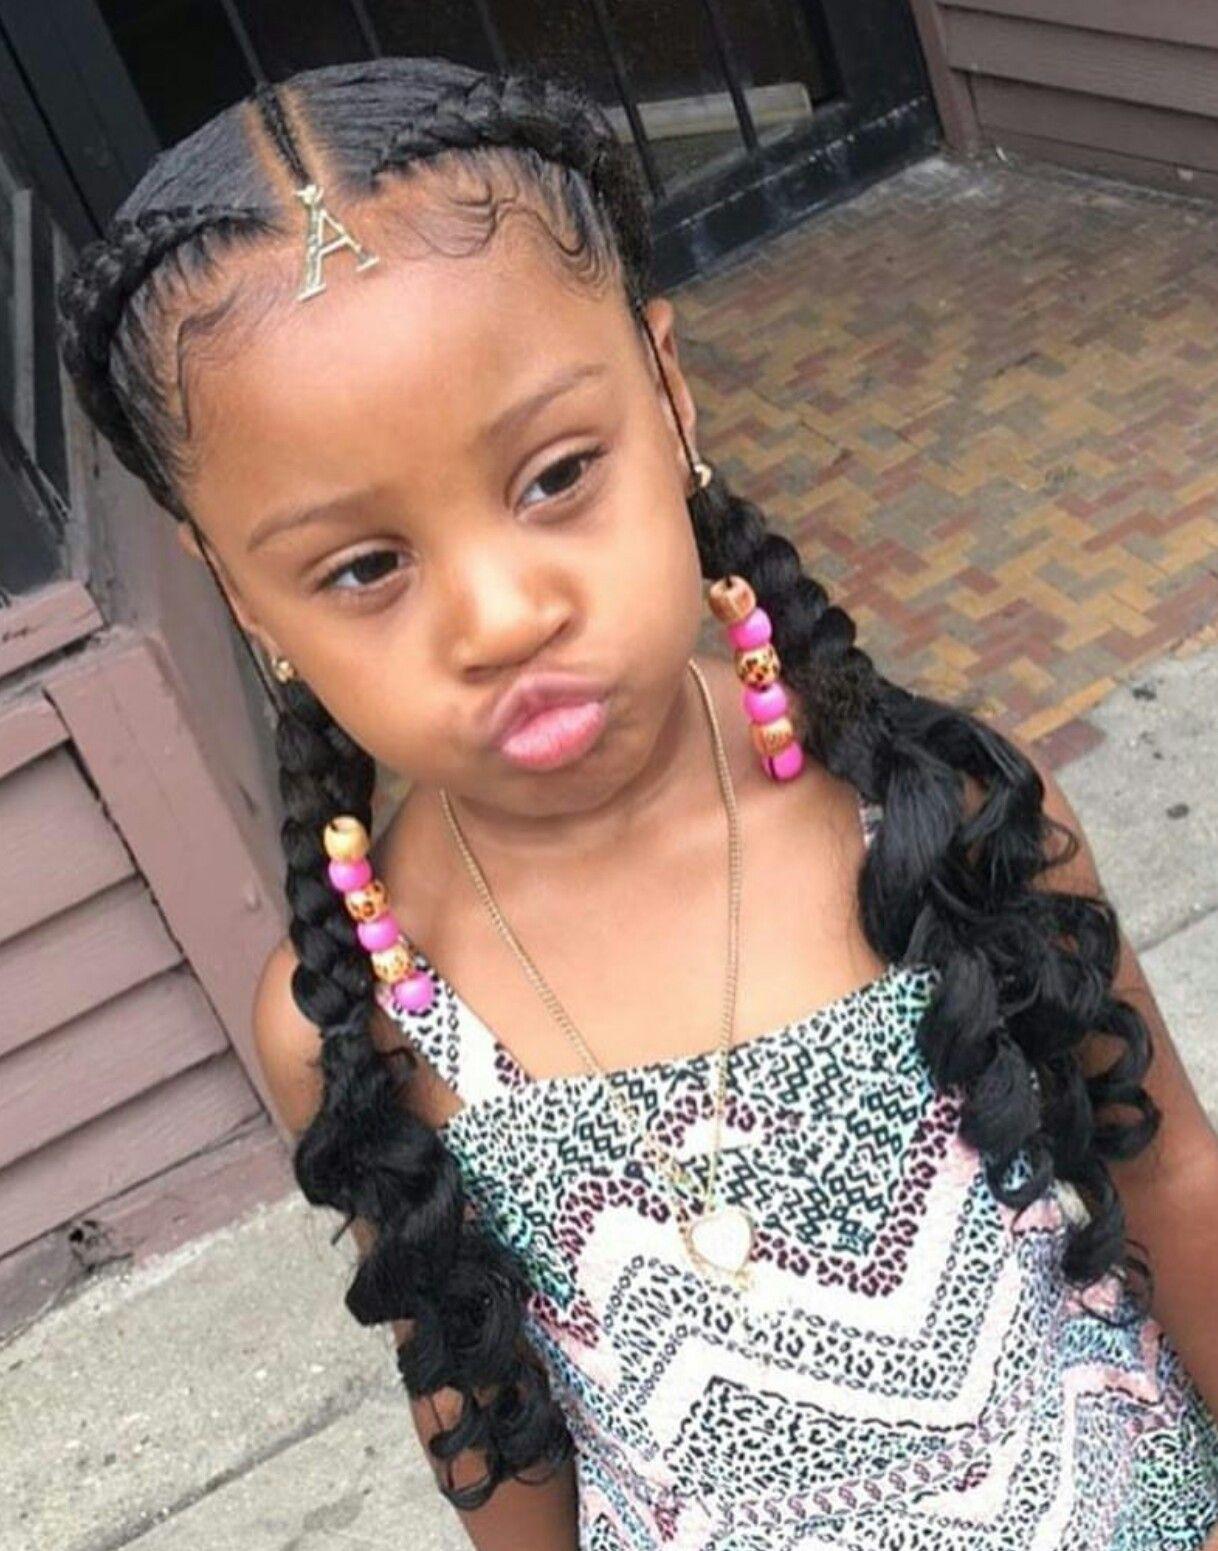 Pin By Desiree Blair On Asia S Hair Black Kids Hairstyles Cute